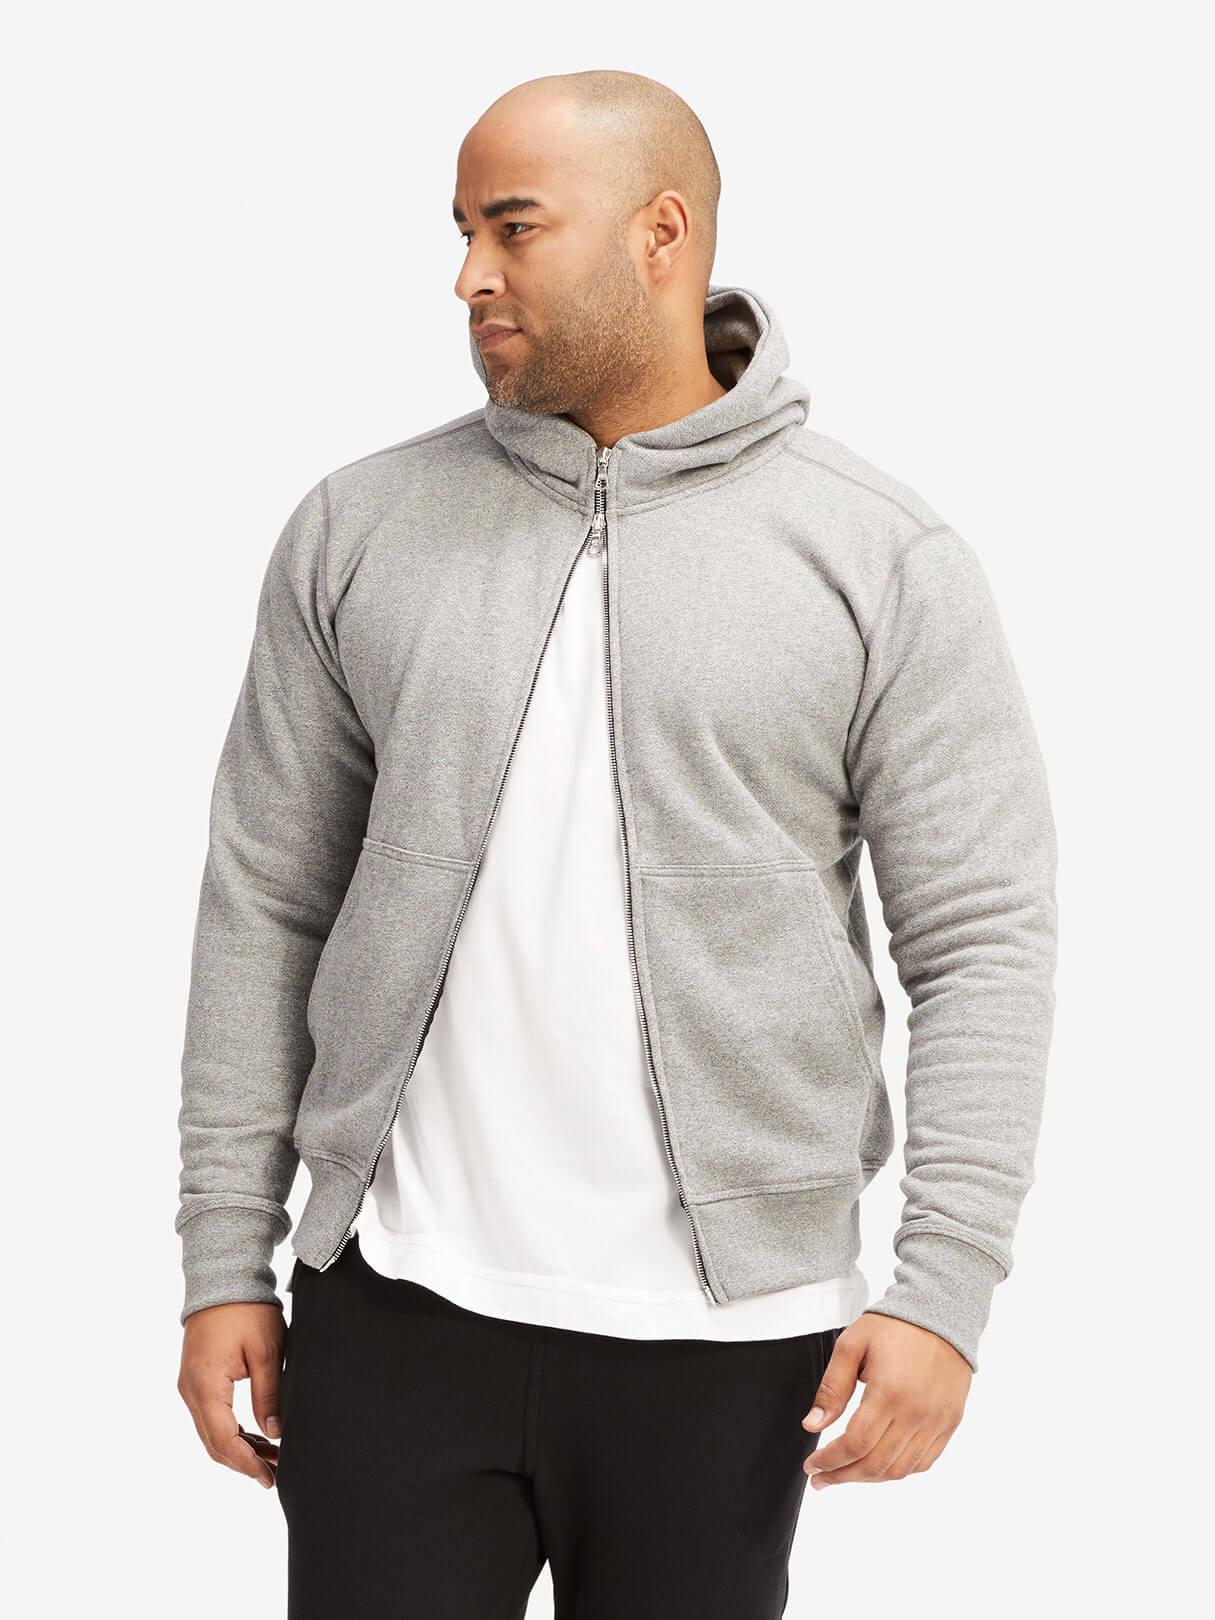 Flash Dual Full-Zip Sweatshirt